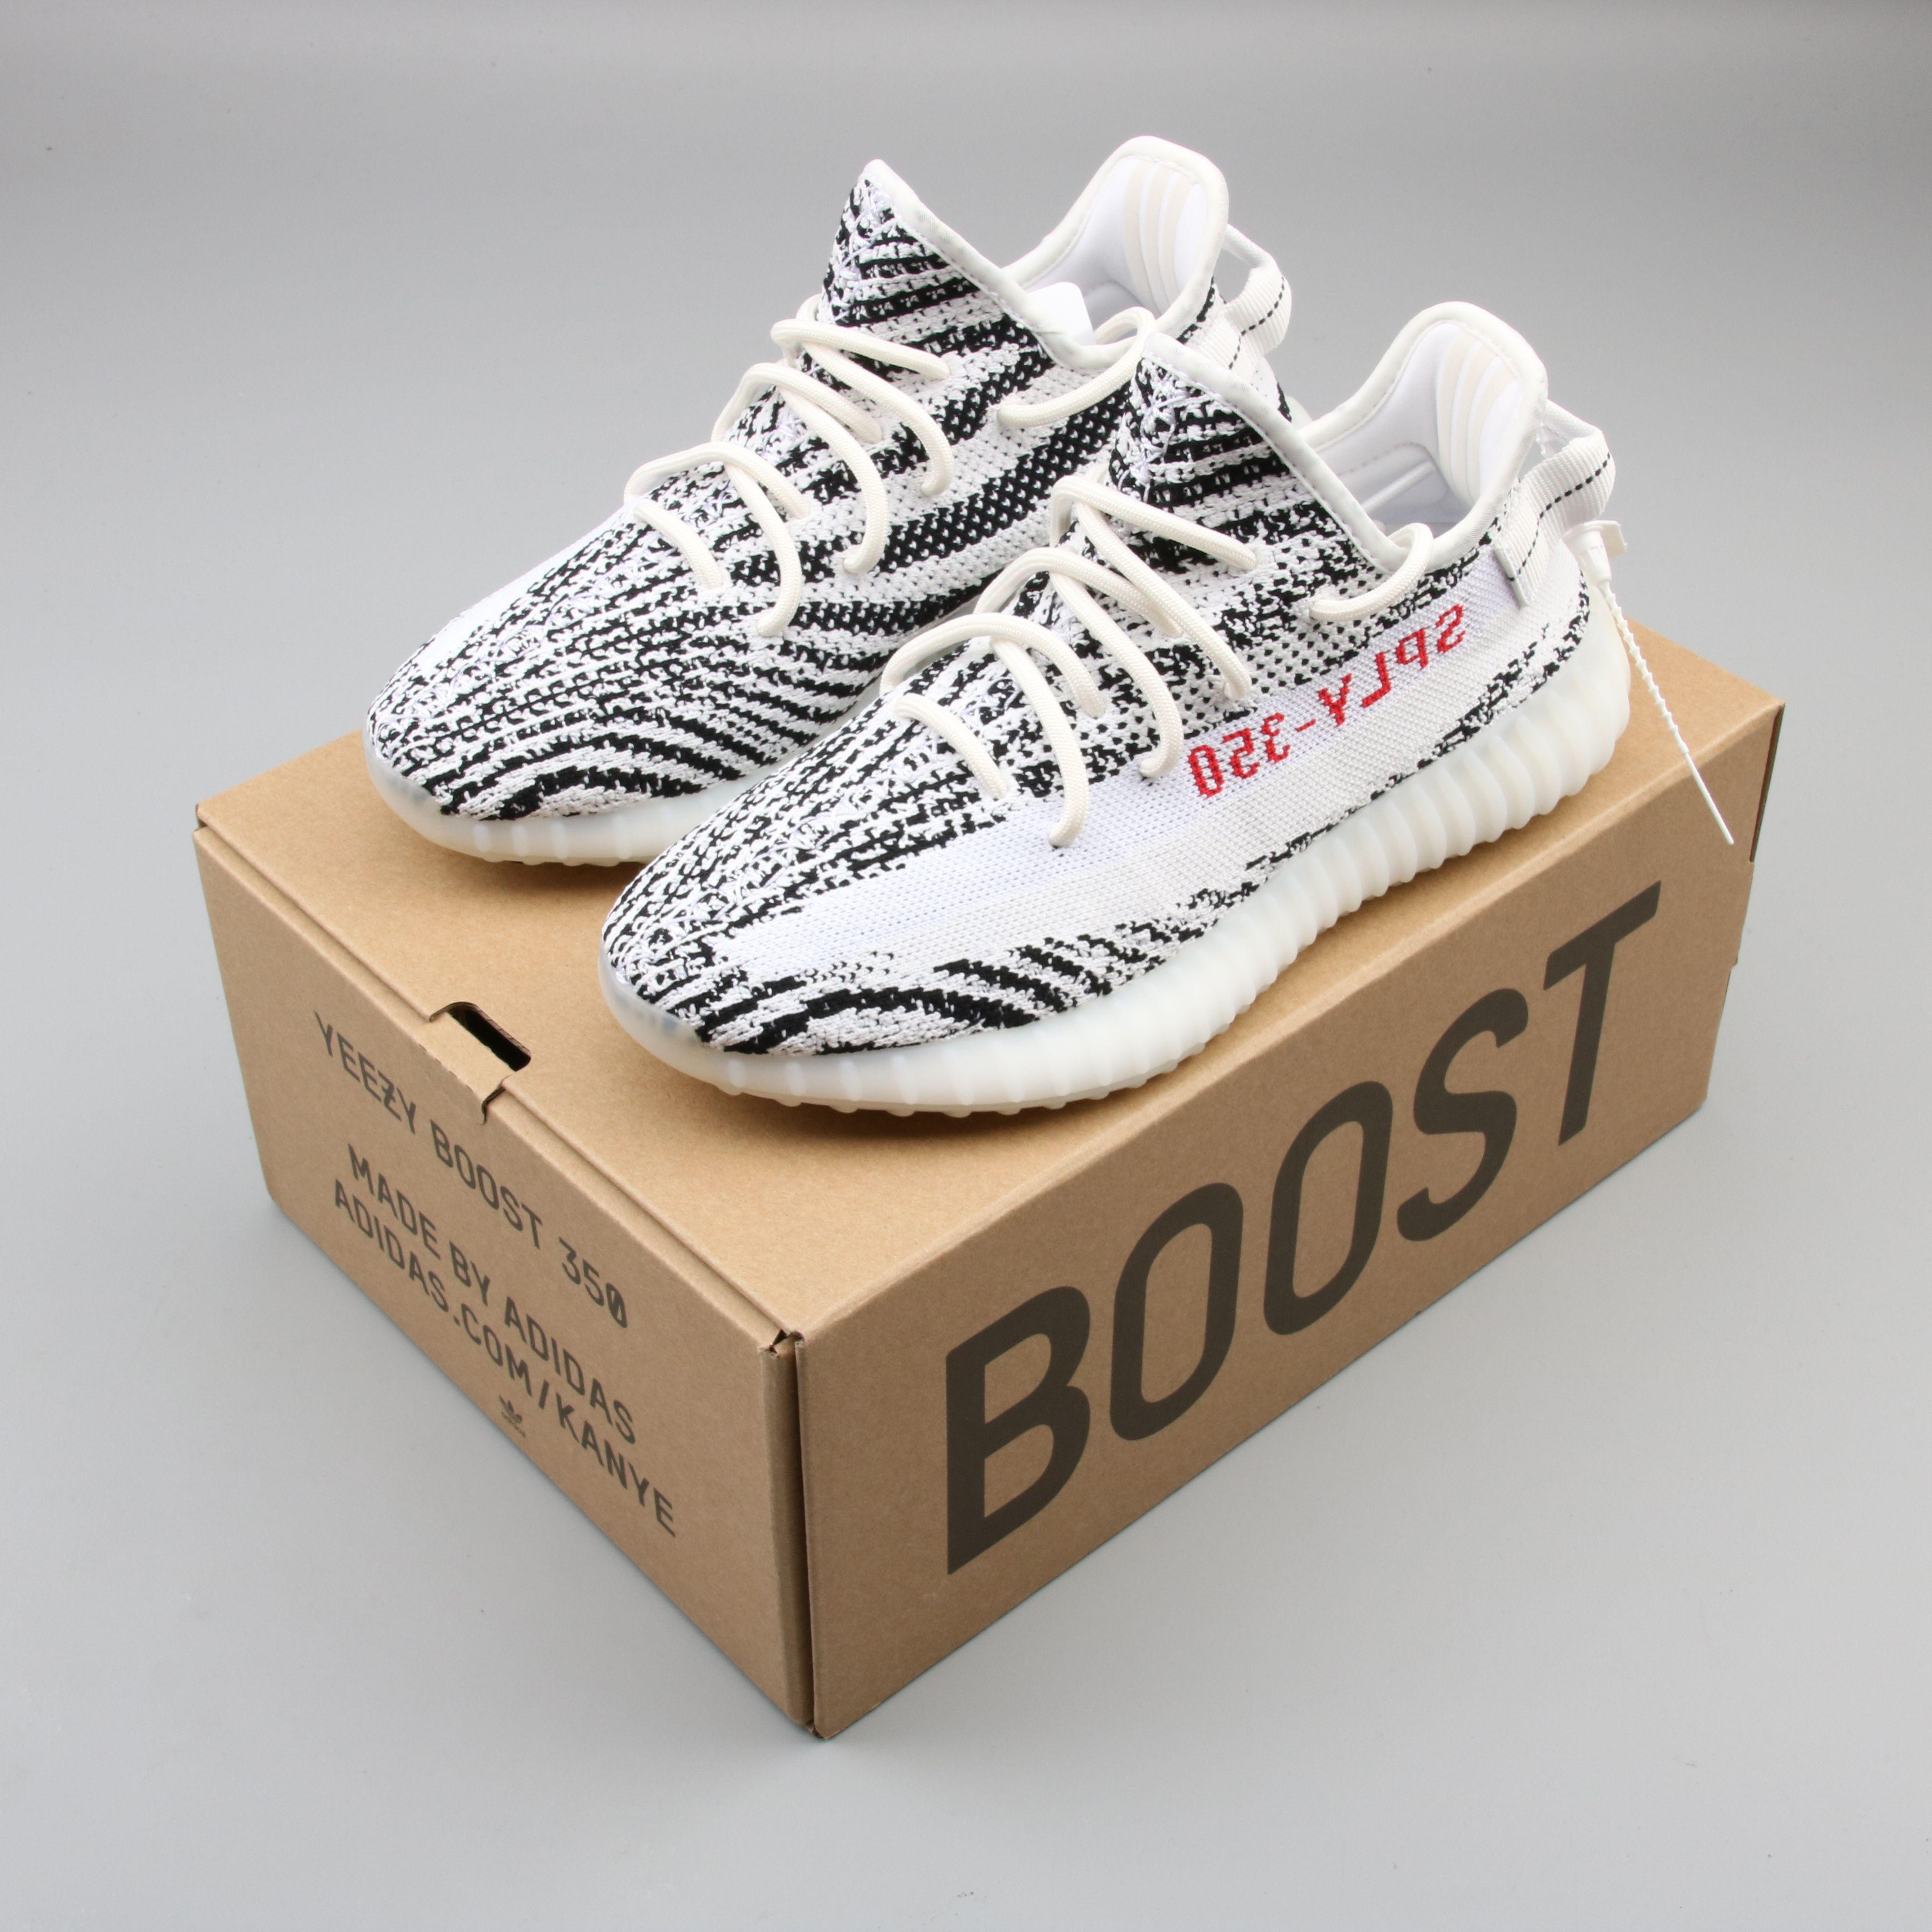 adidas yeezy boost 350 v2 zebra cp9654